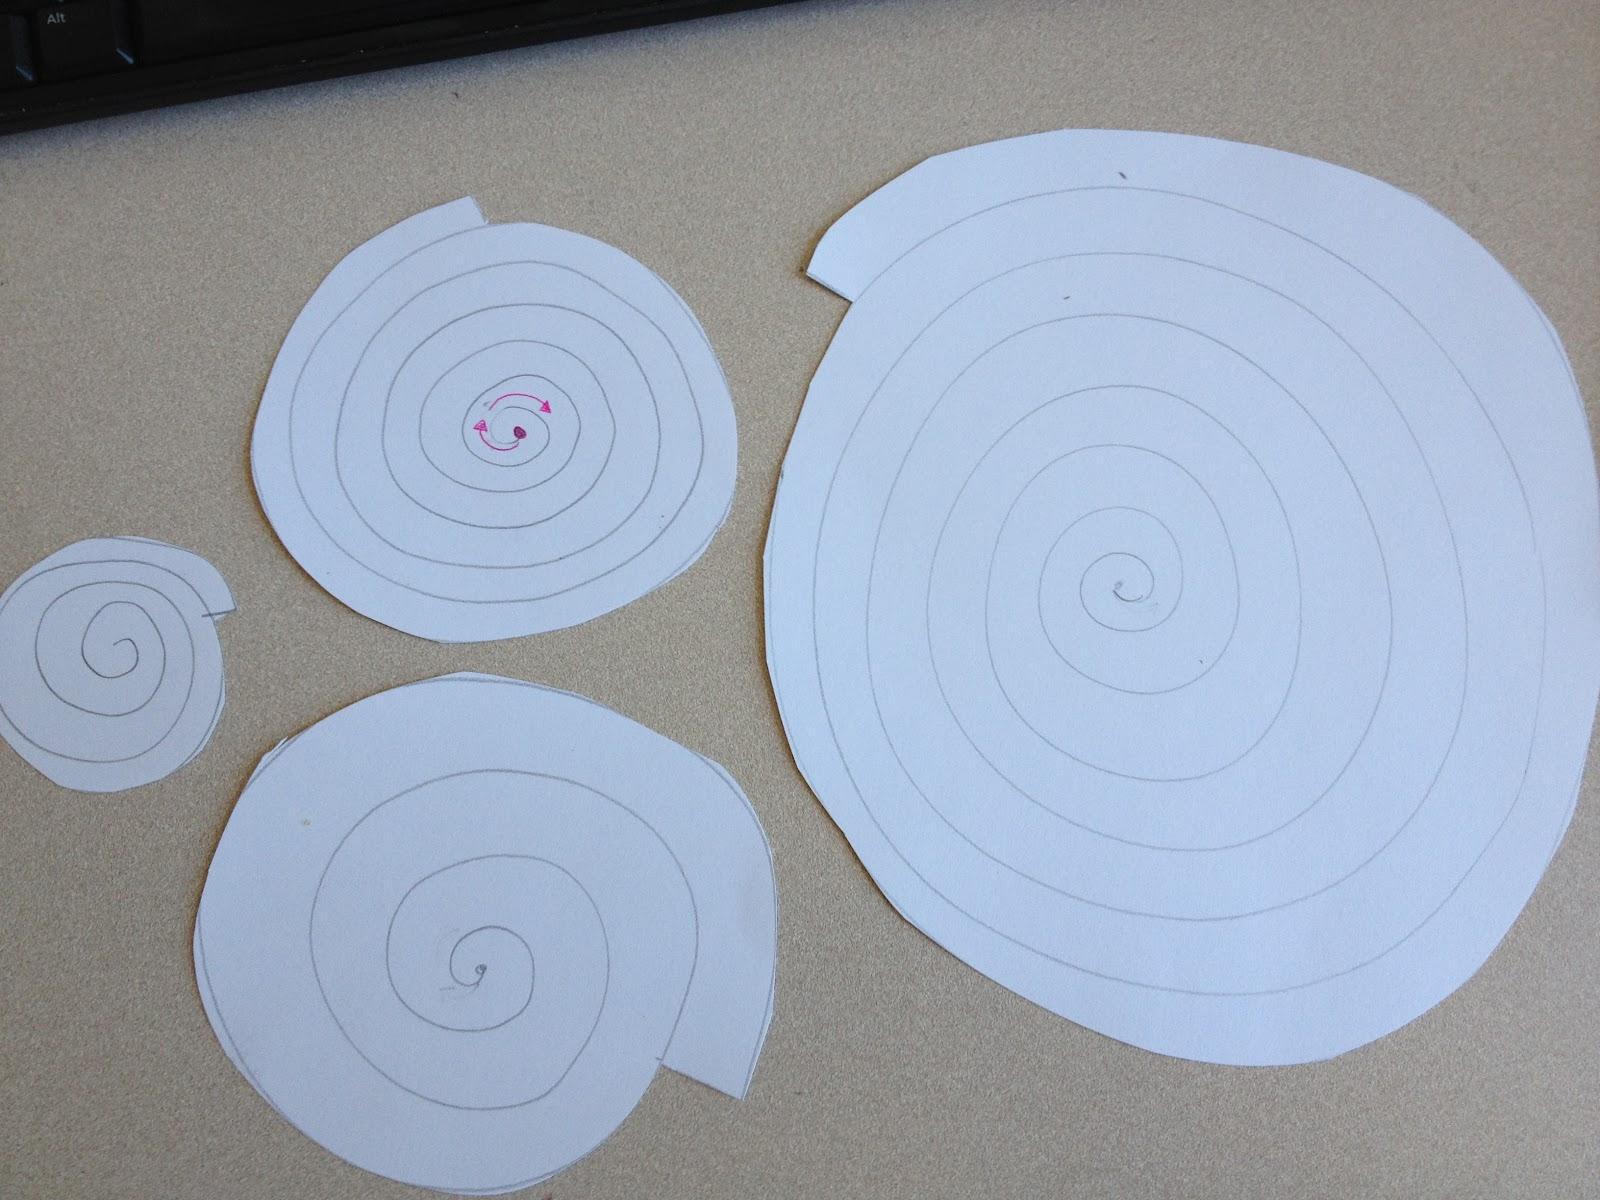 Drawn swirl paper Almost pictured Glue Guns: sheet